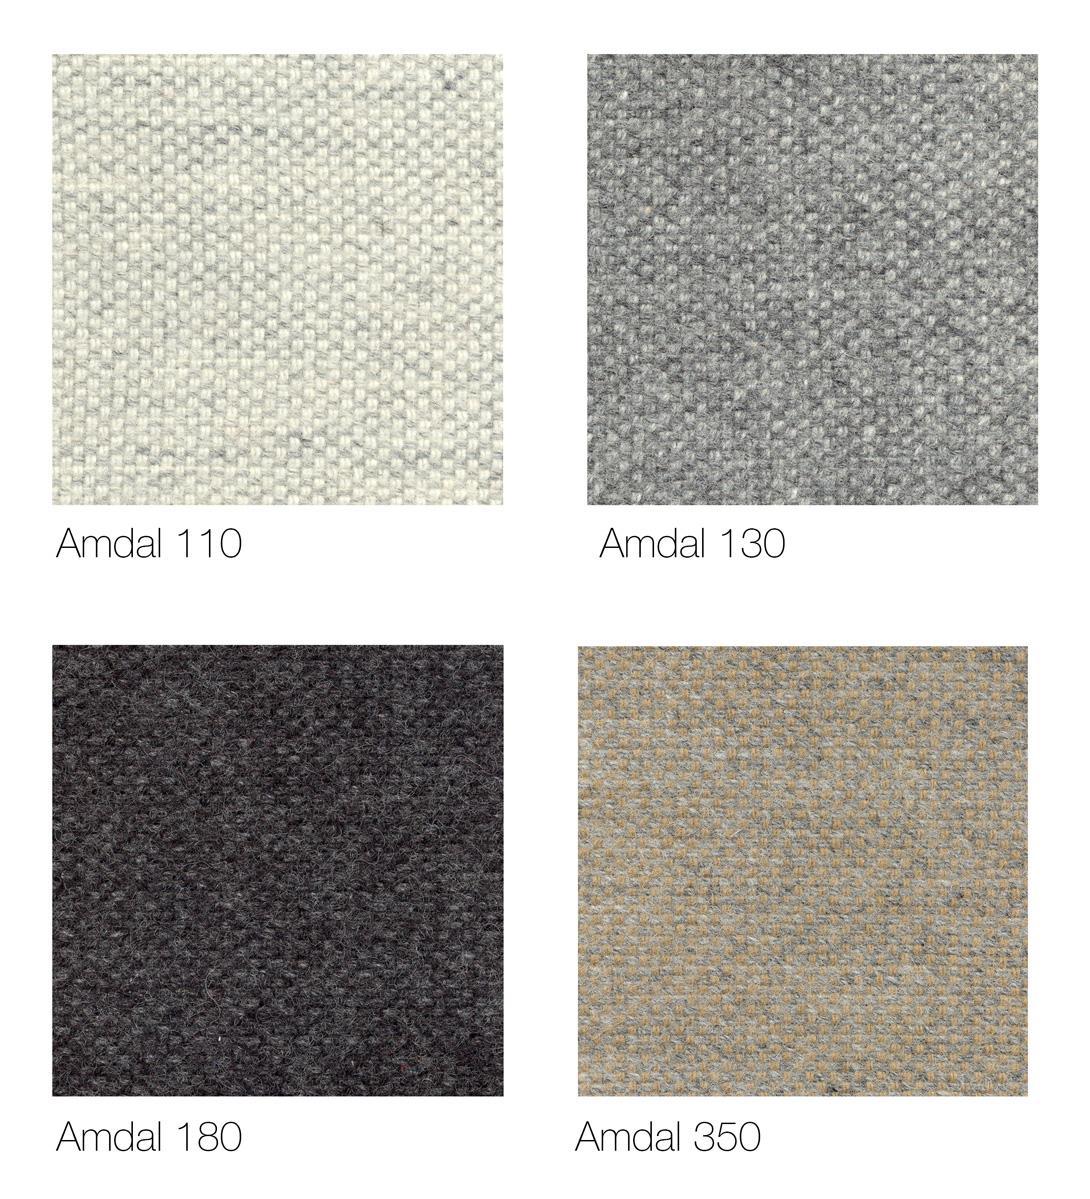 Standard fabrics